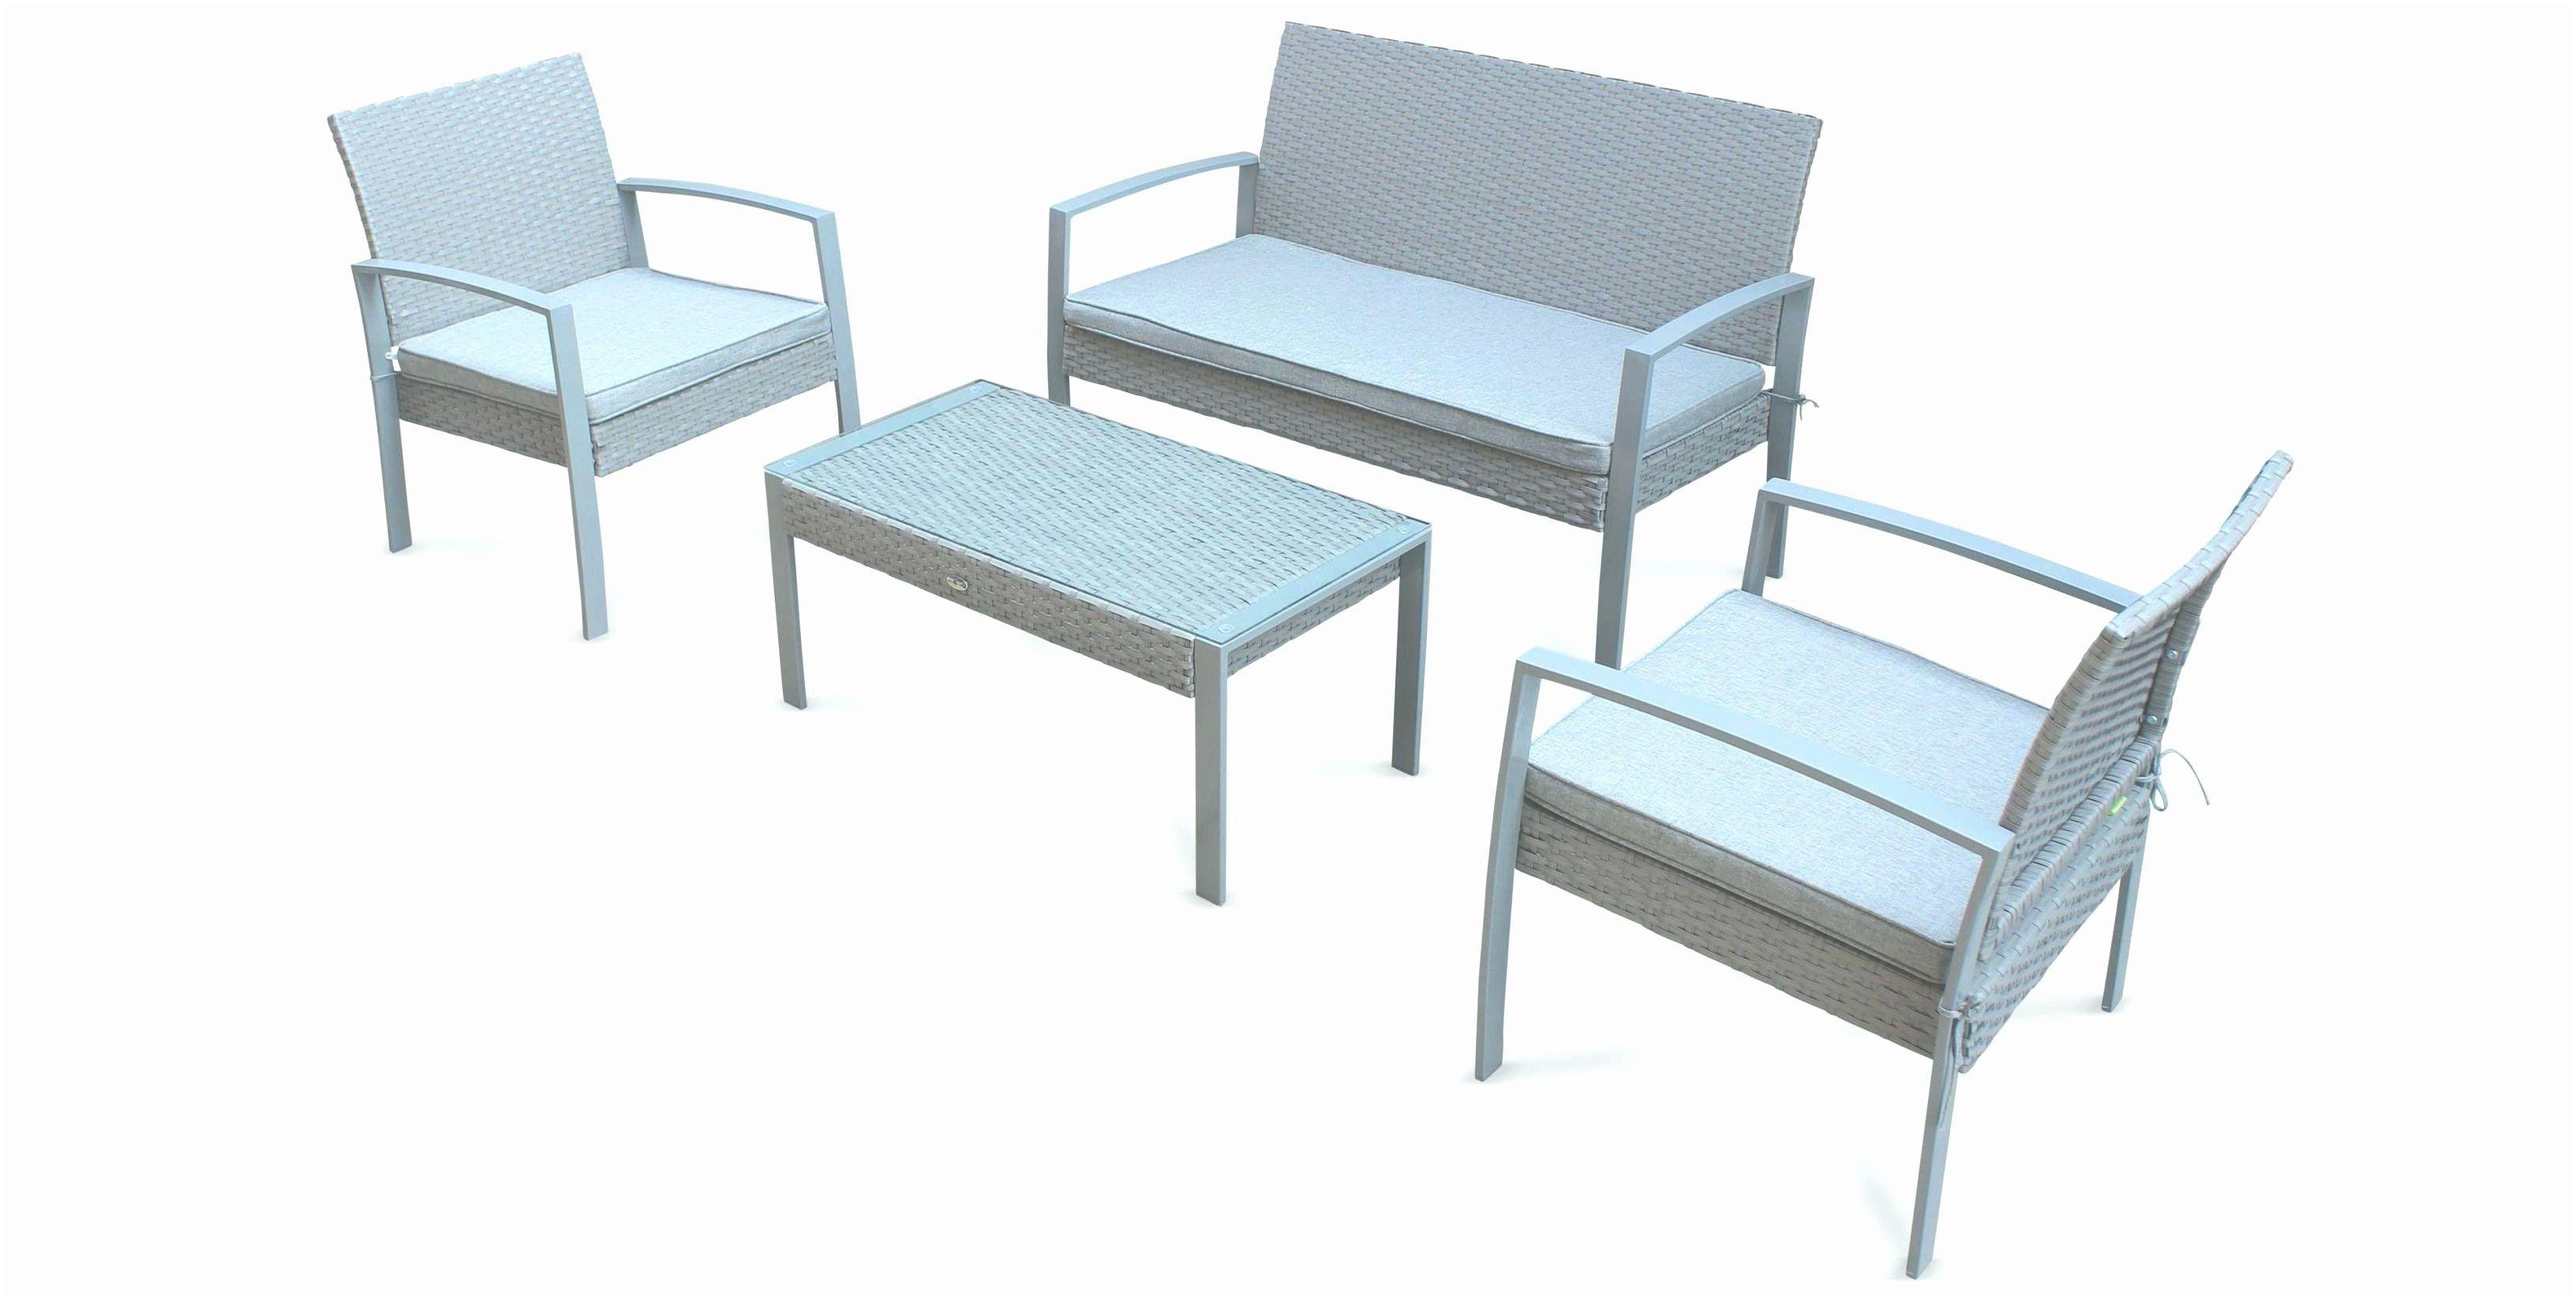 11 Beau Meuble Gain De Place Photo Outdoor Furniture Sets Furniture Outdoor Chairs